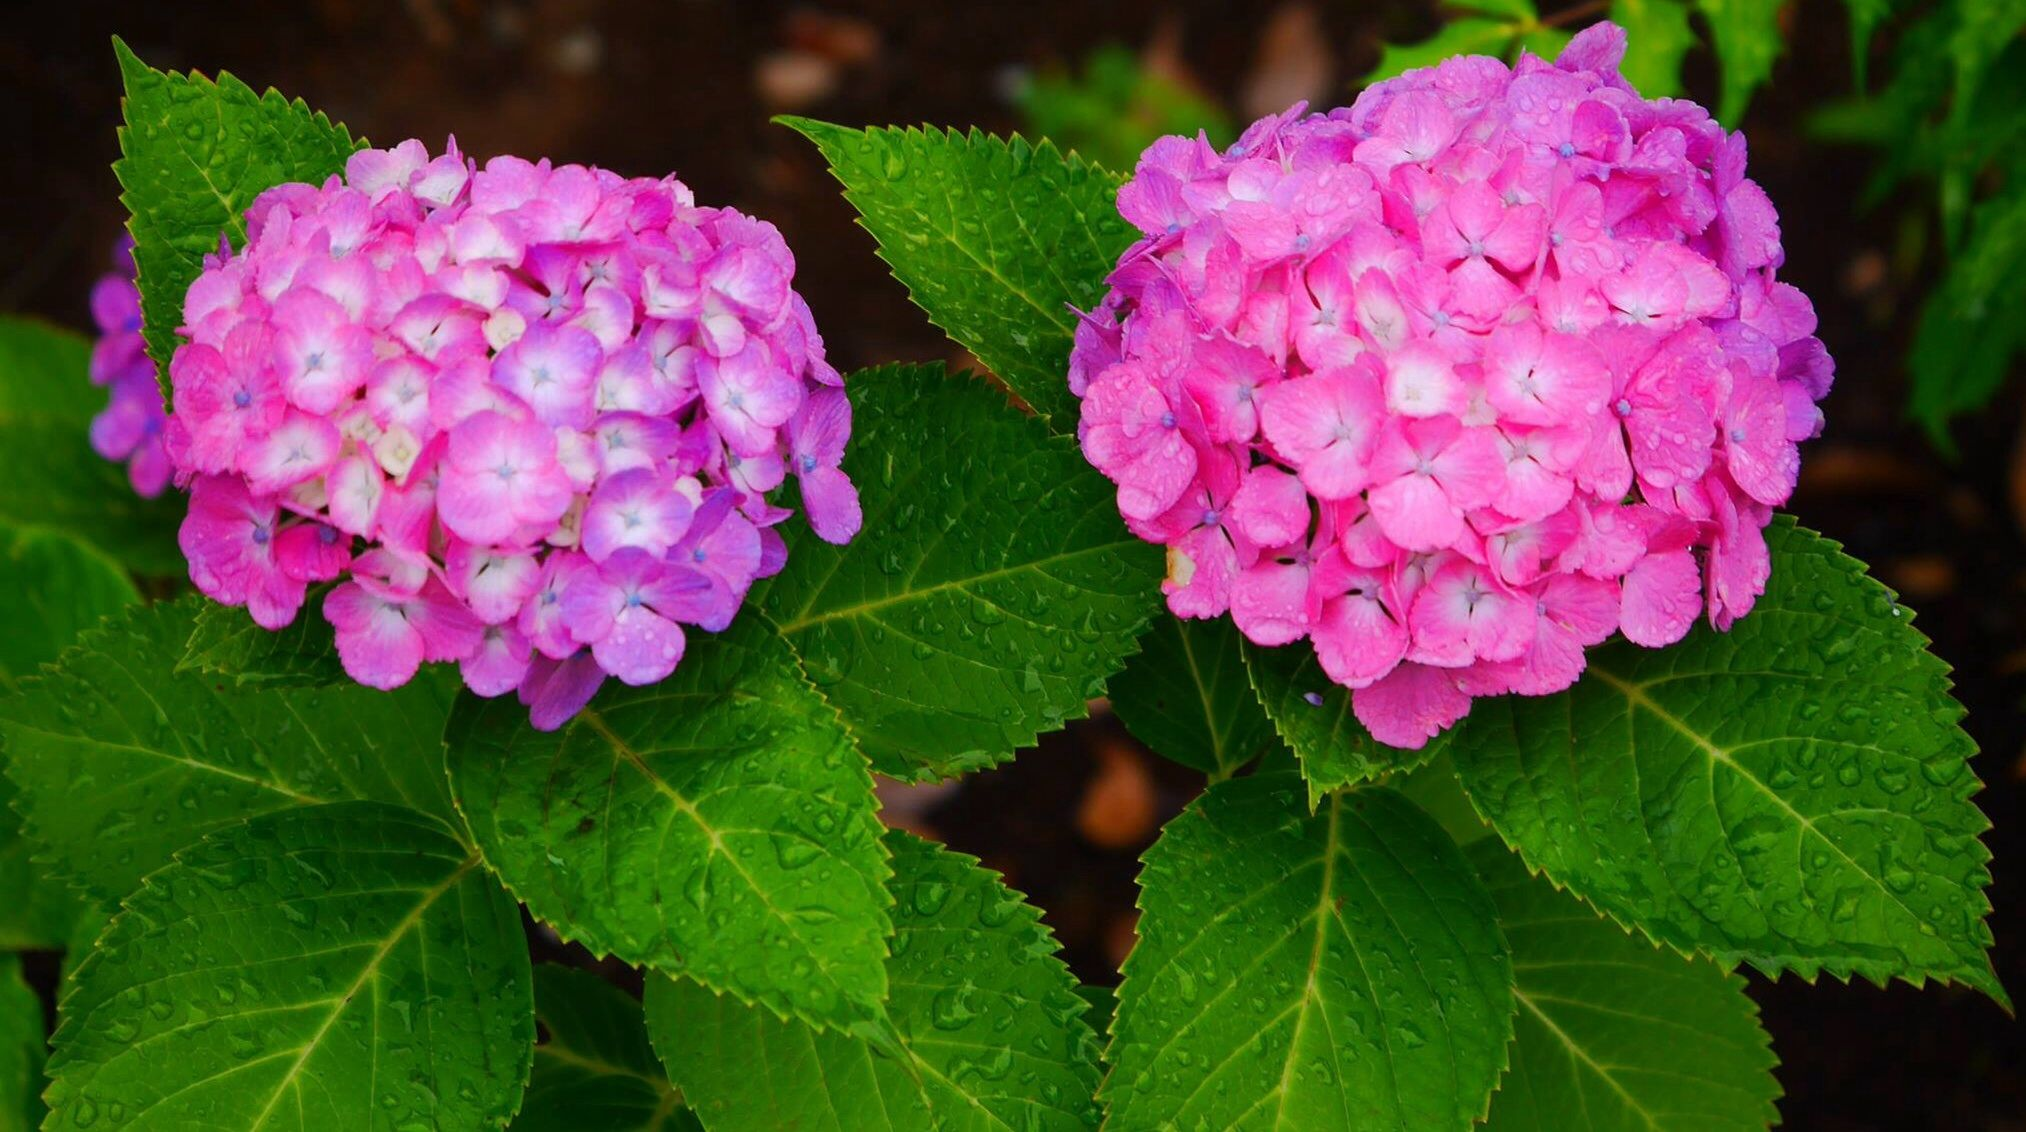 Hydrangea-photo by Nishioka